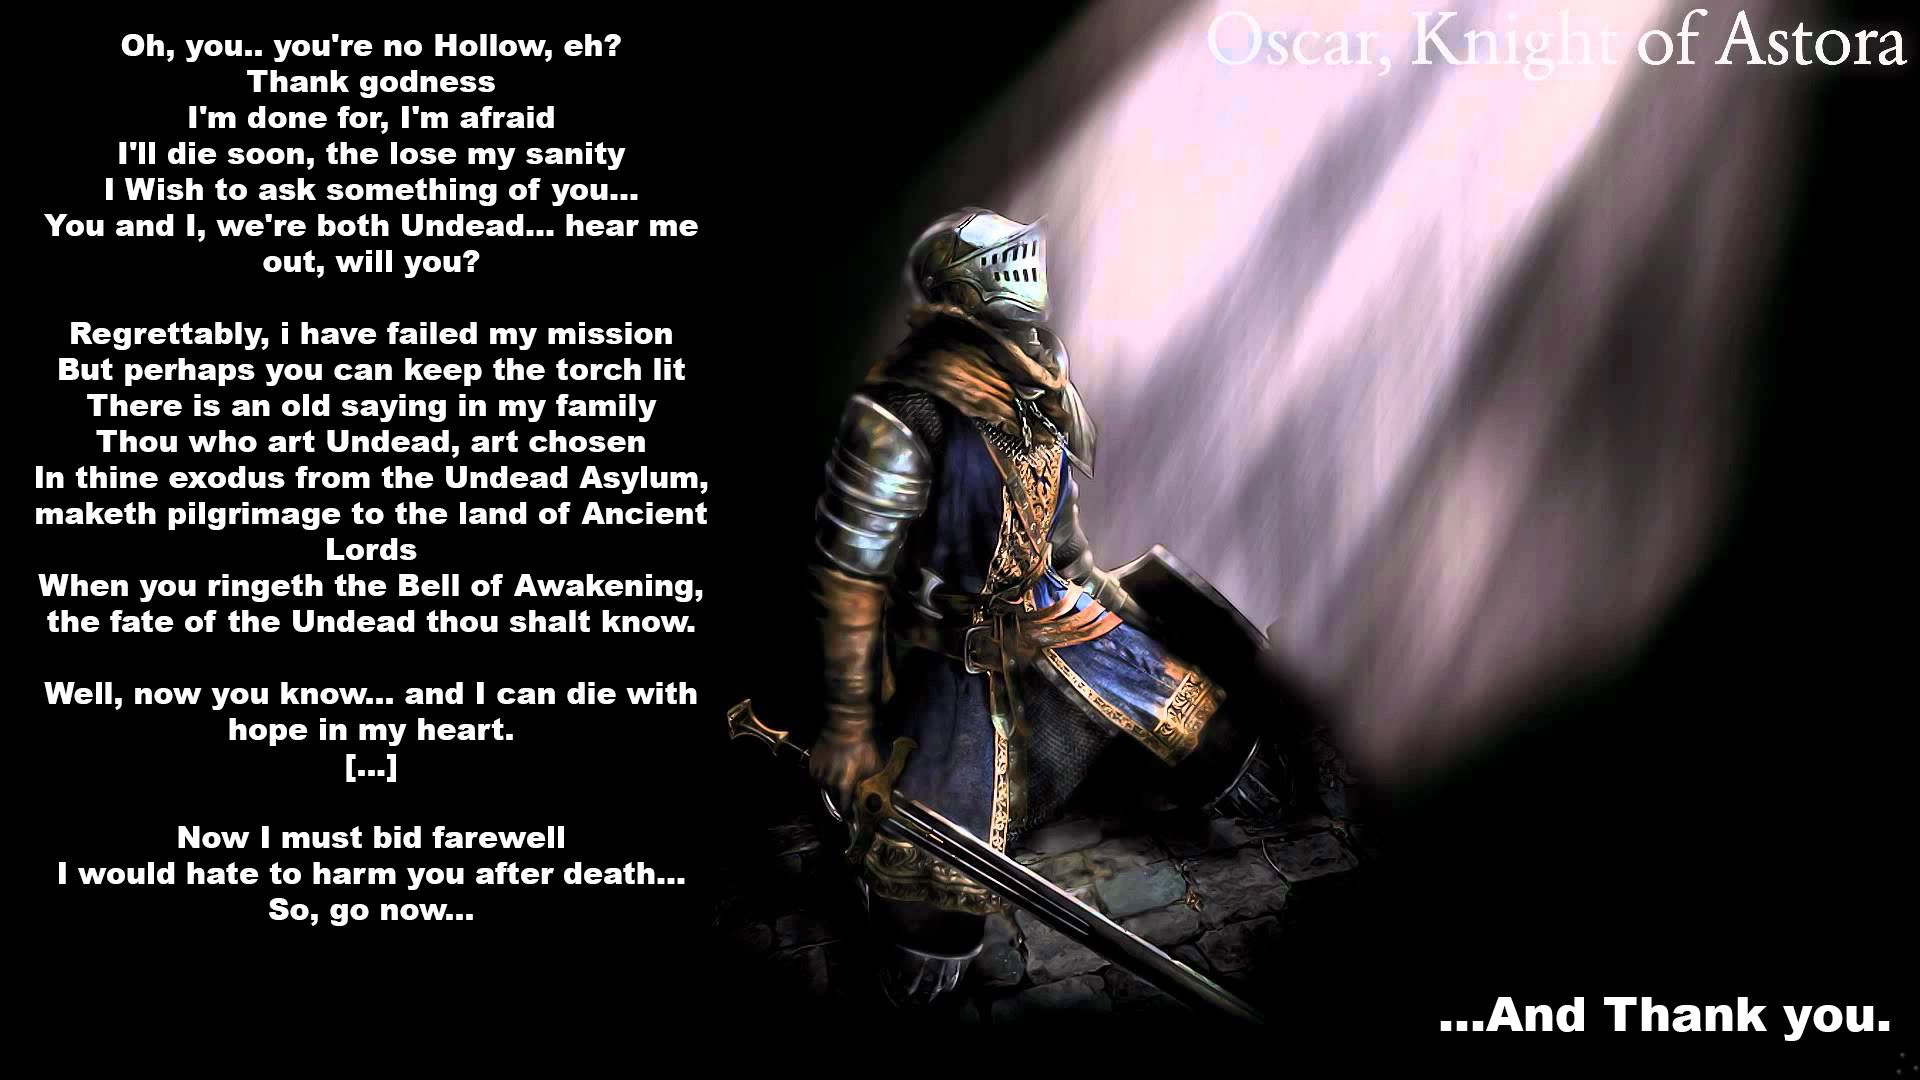 Quotes About Dark Souls: Oscar, Knight Of Astora - Dark Souls